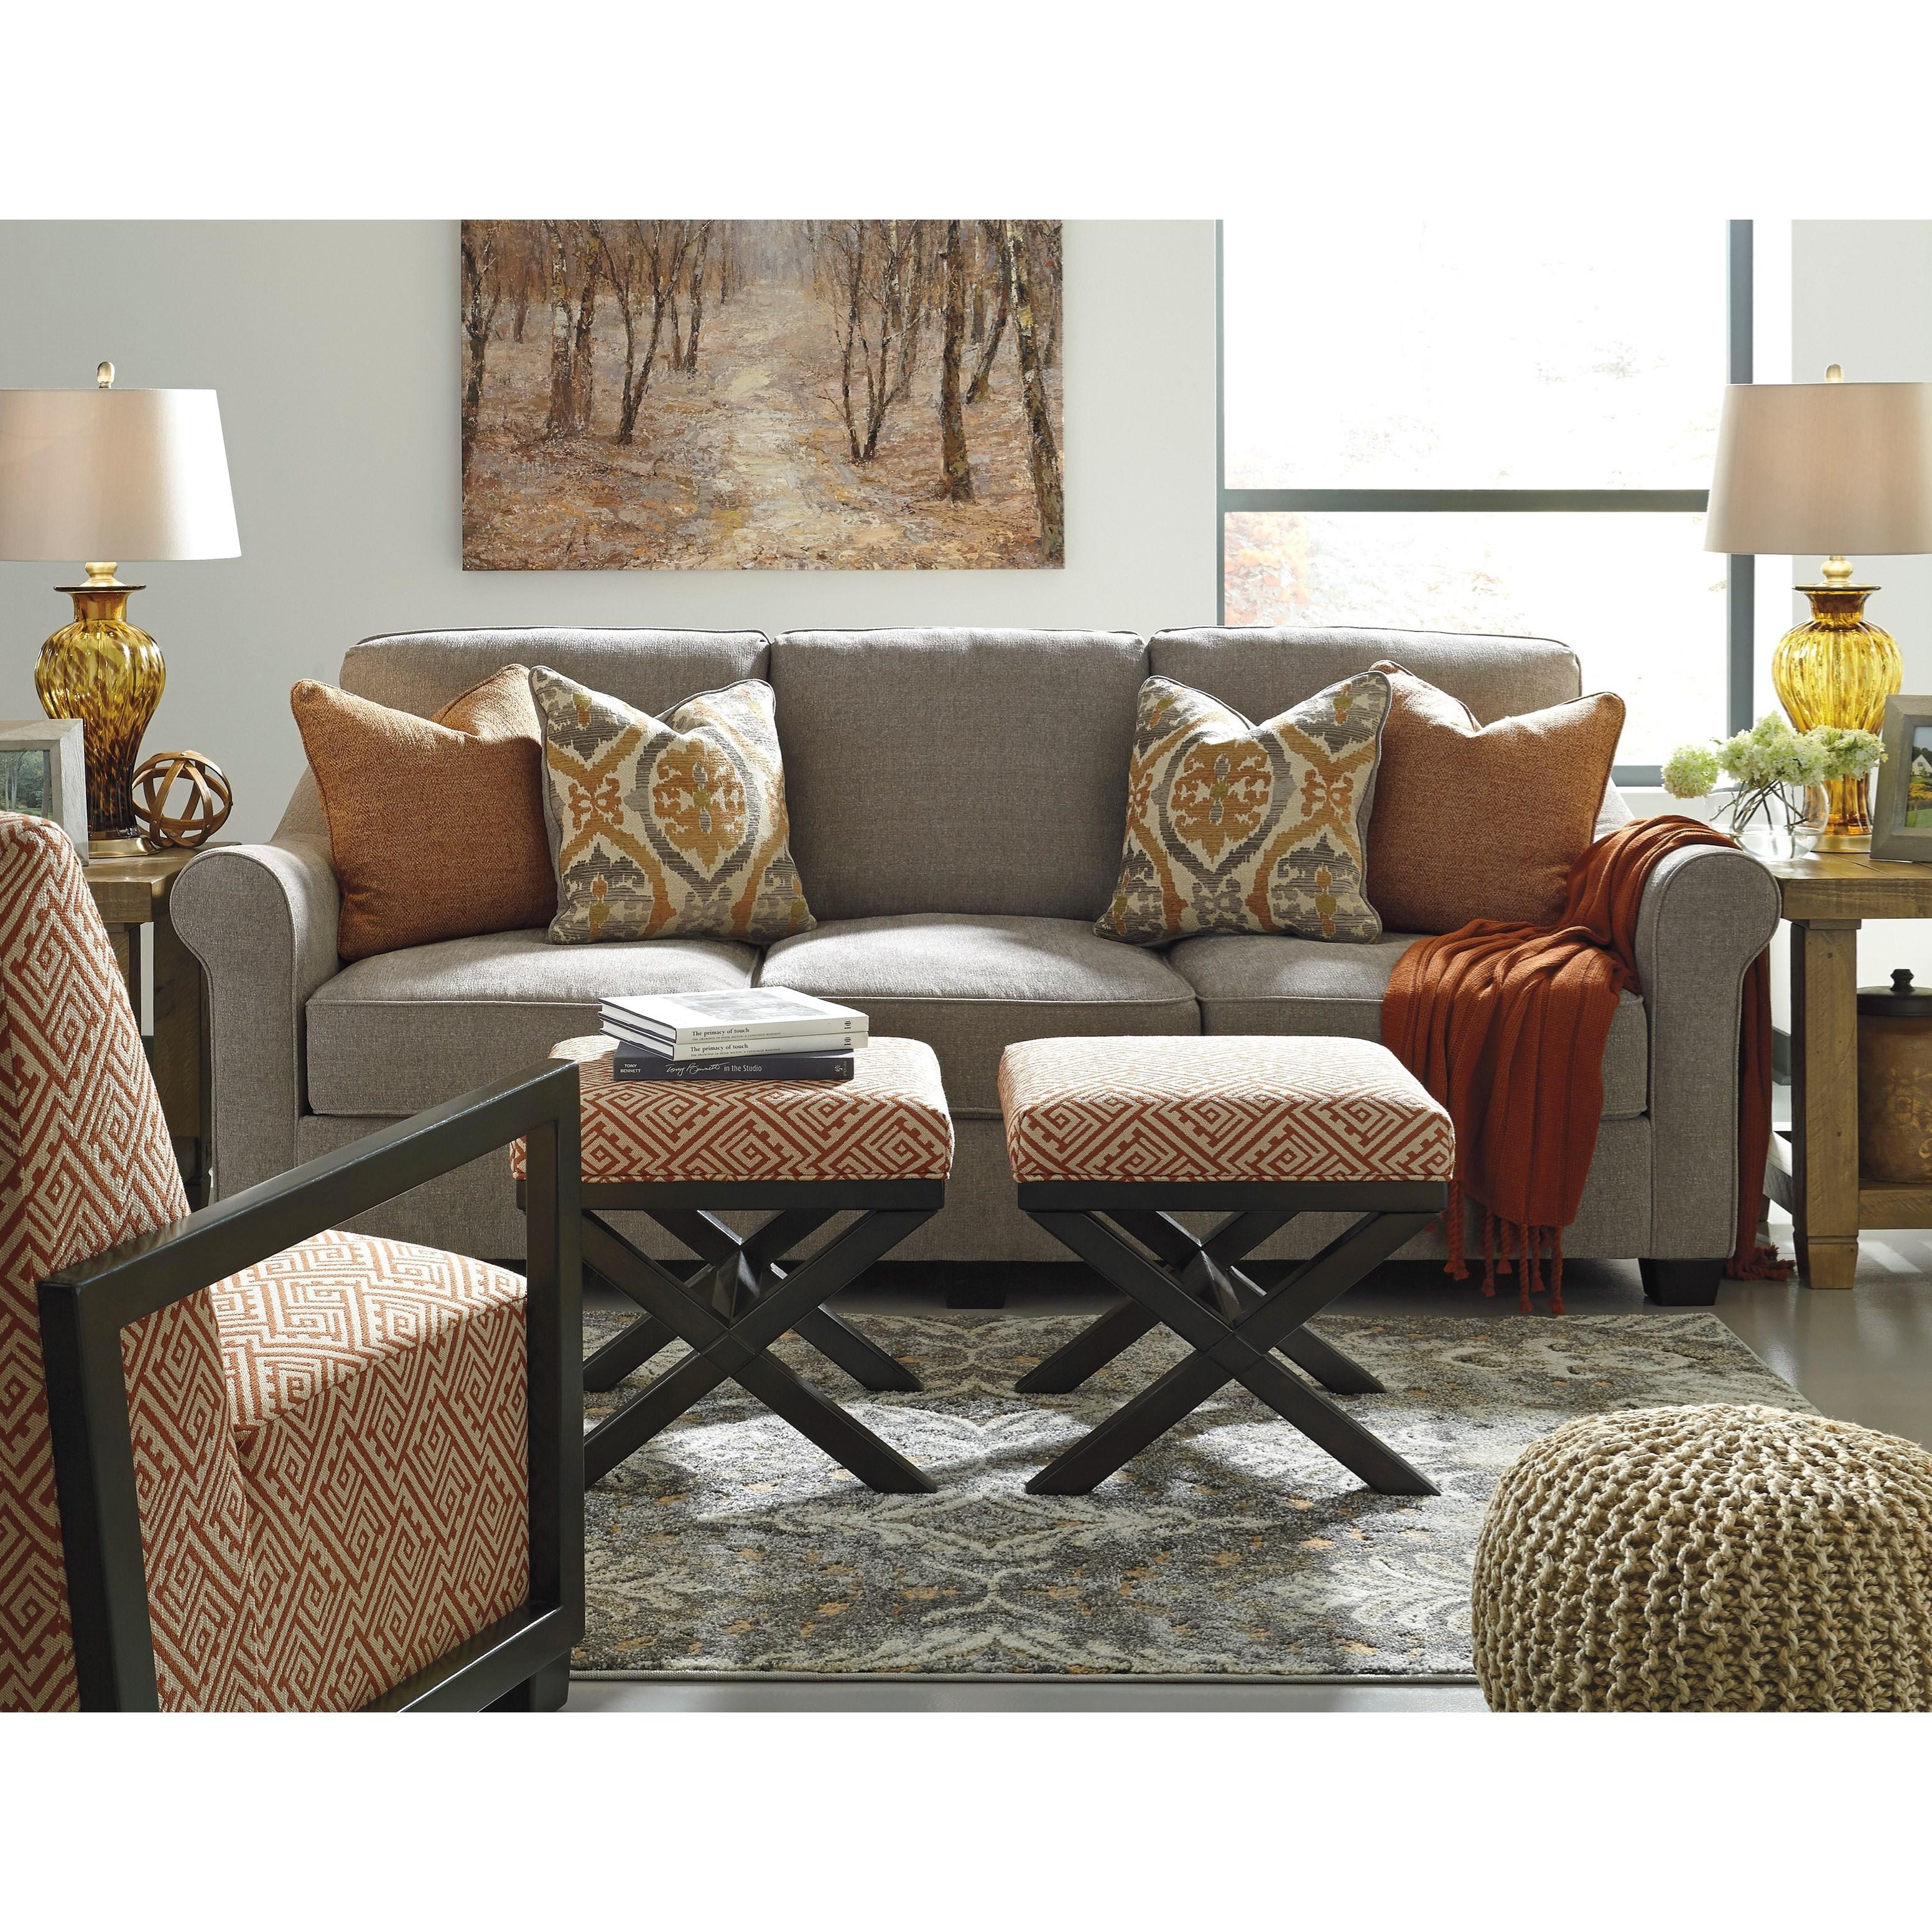 Benchcraft Leola Stationary Living Room Group Zak 39 S Fine Furniture St